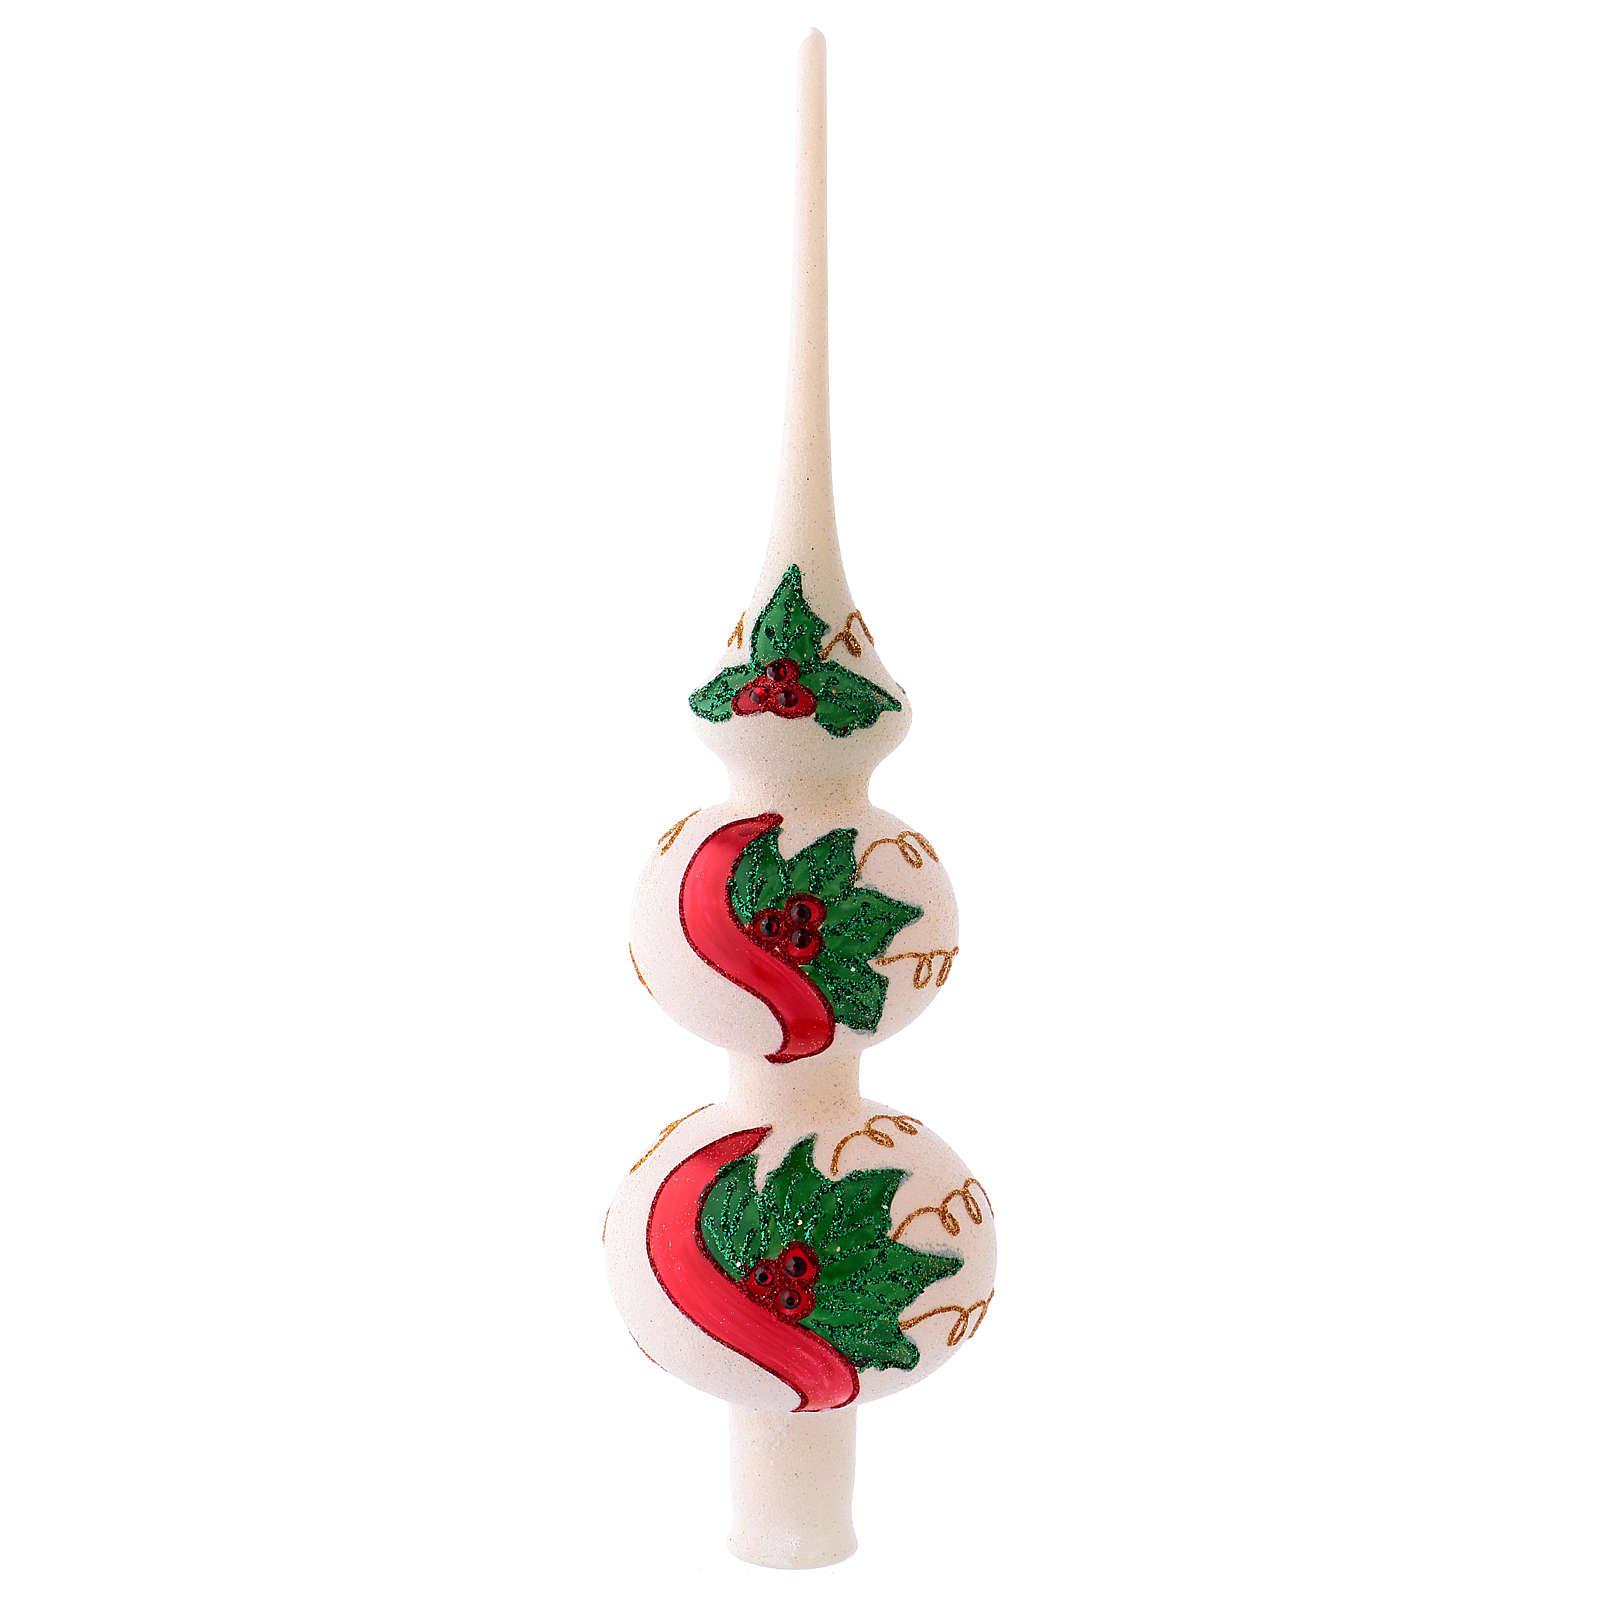 Punta vidrio soplado árbol Navidad blanco muérdago 36 cm 4